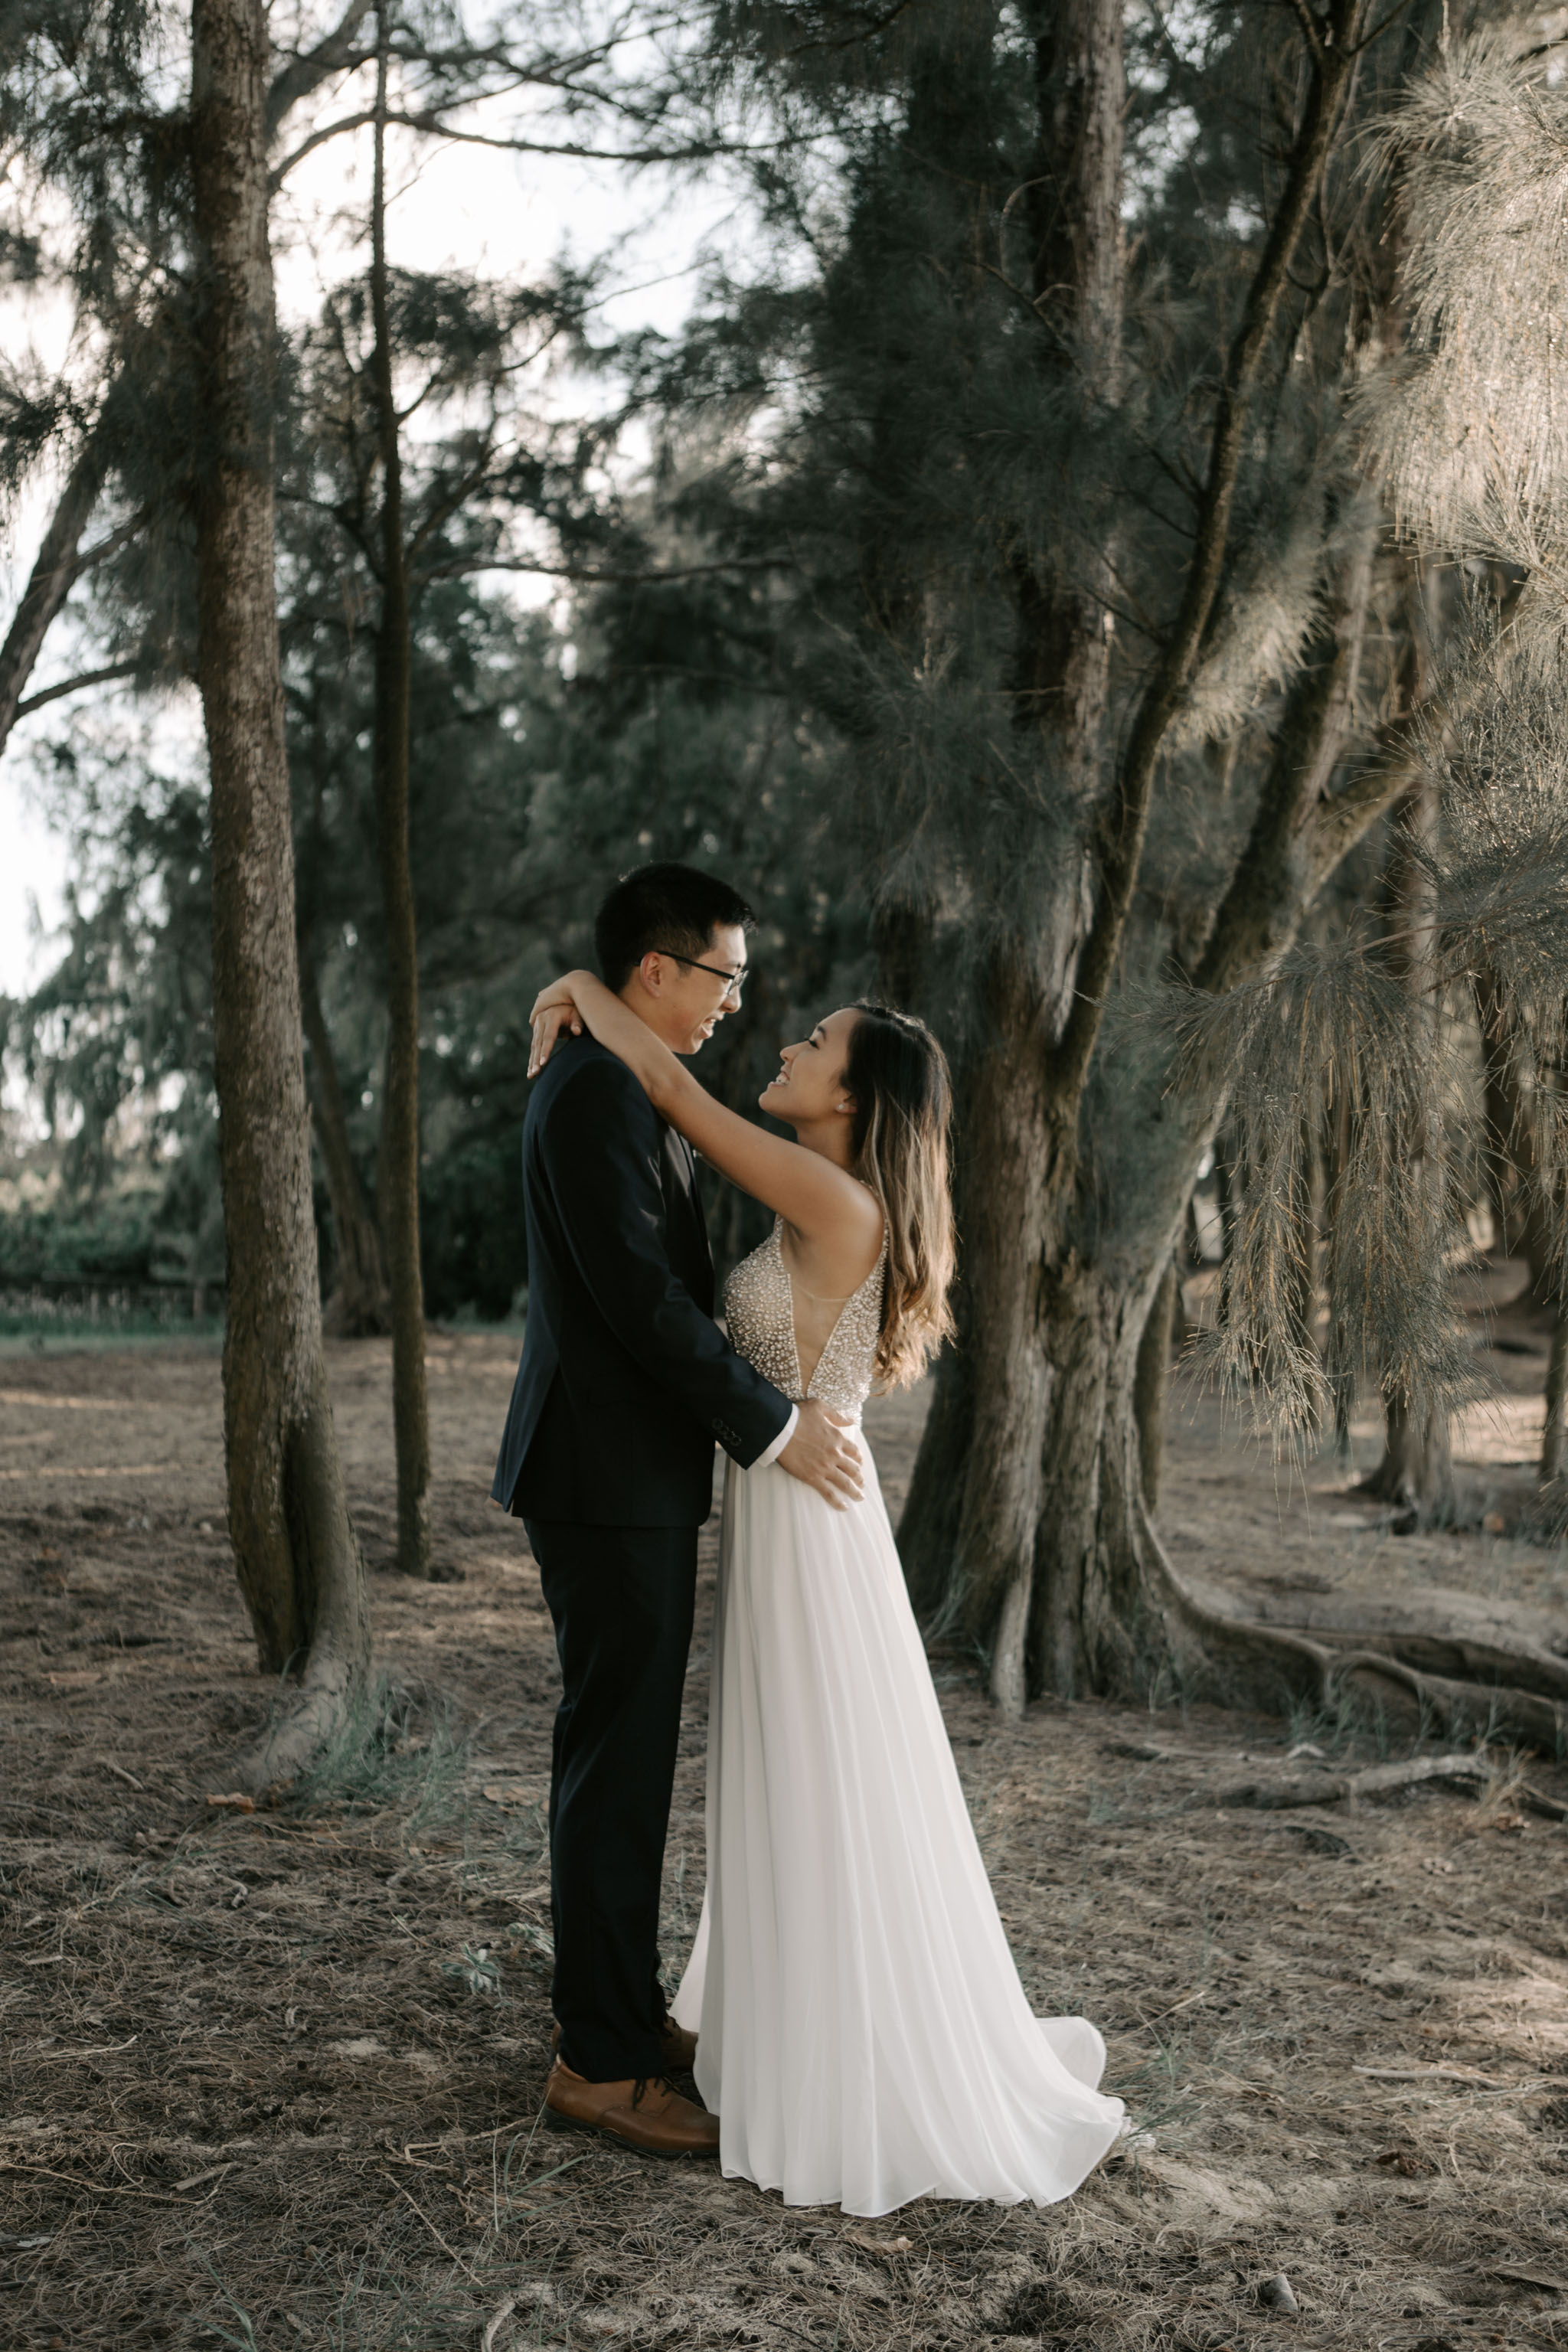 The Stables at Turtle Bay Resort Wedding by Hawaii Fine Art Wedding Photographer Desiree Leilani